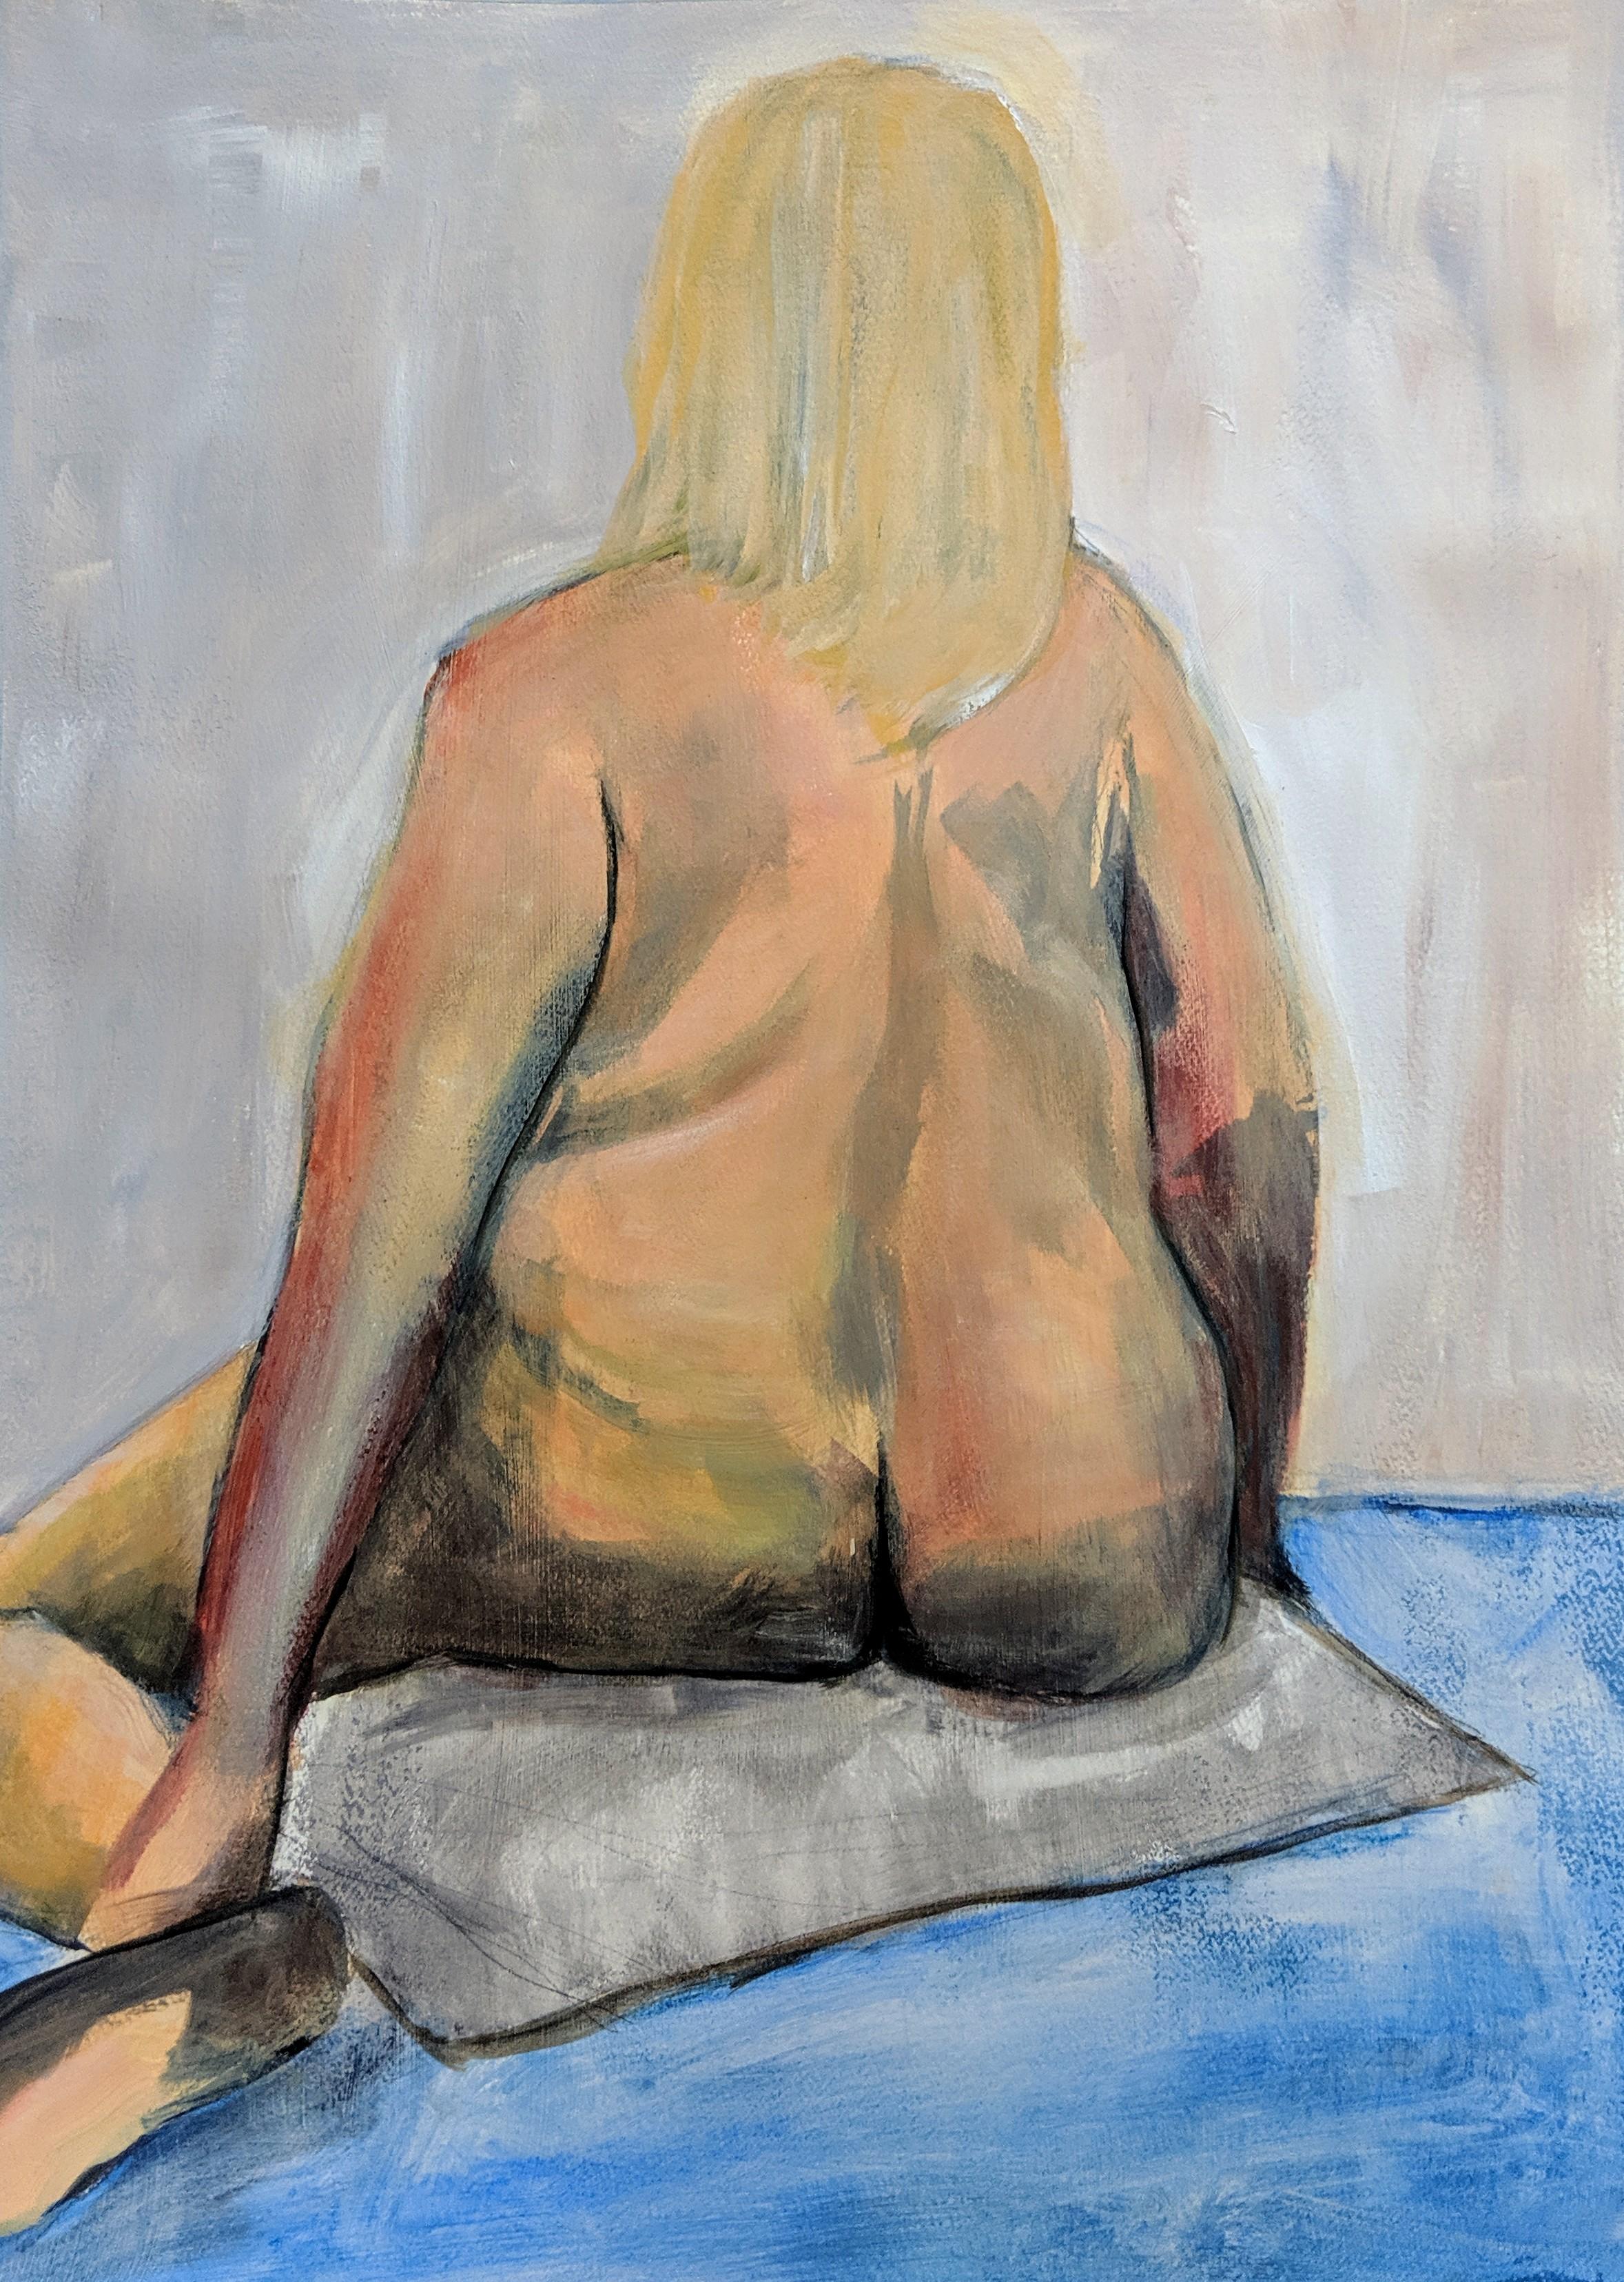 ©2019 Agnes Peters | Figure Painting & Drawing Workshop, San Luis Obispo County (Arroyo Grande, CA) | David Limrite, Instructor